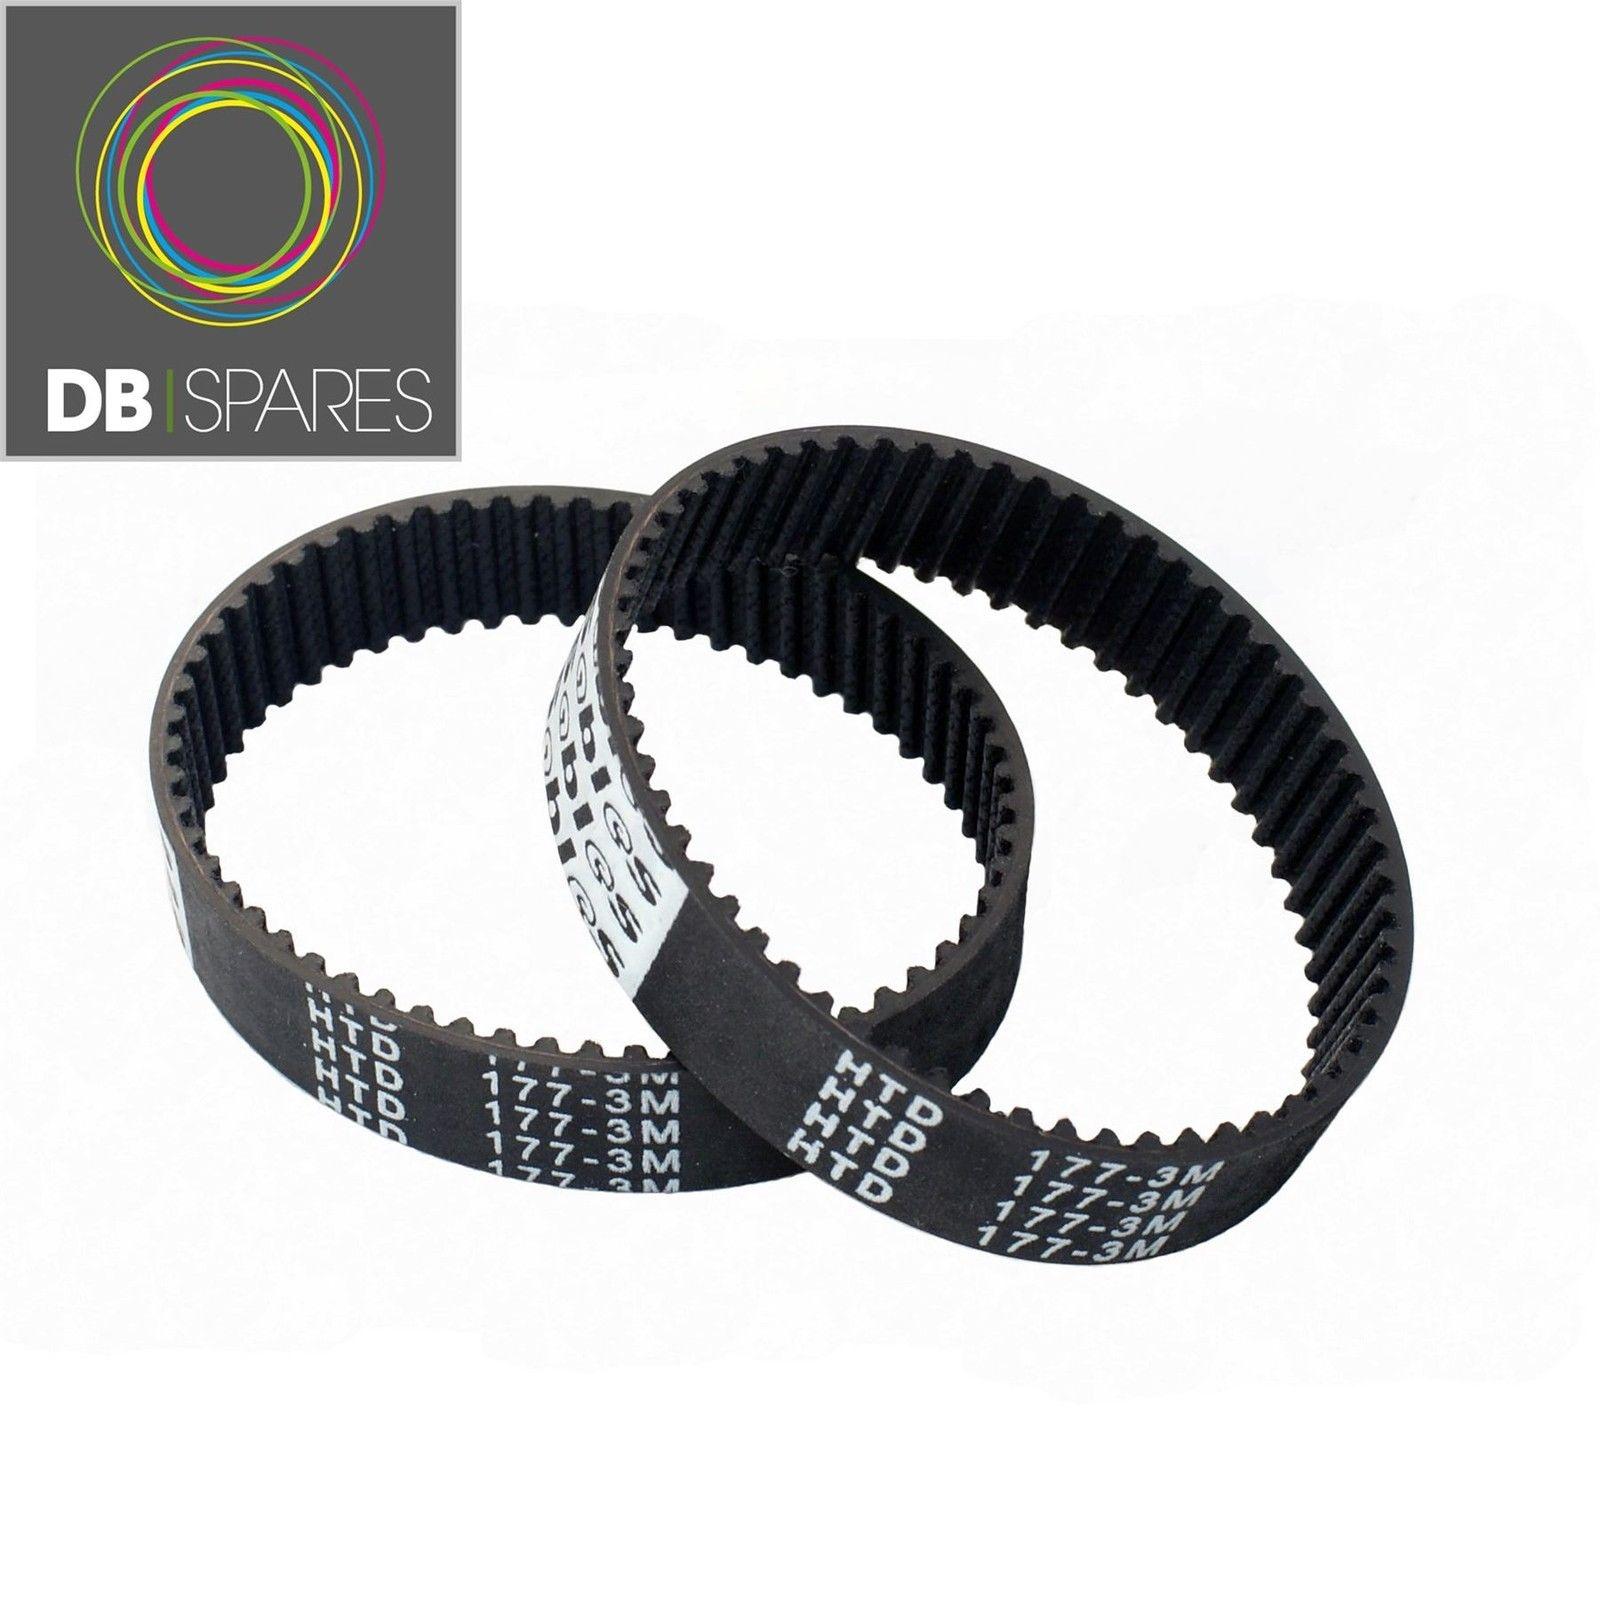 2 X Planer Drive Belt For Black And Decker & Kw715 Kw713 Bd713 177-3m X40515